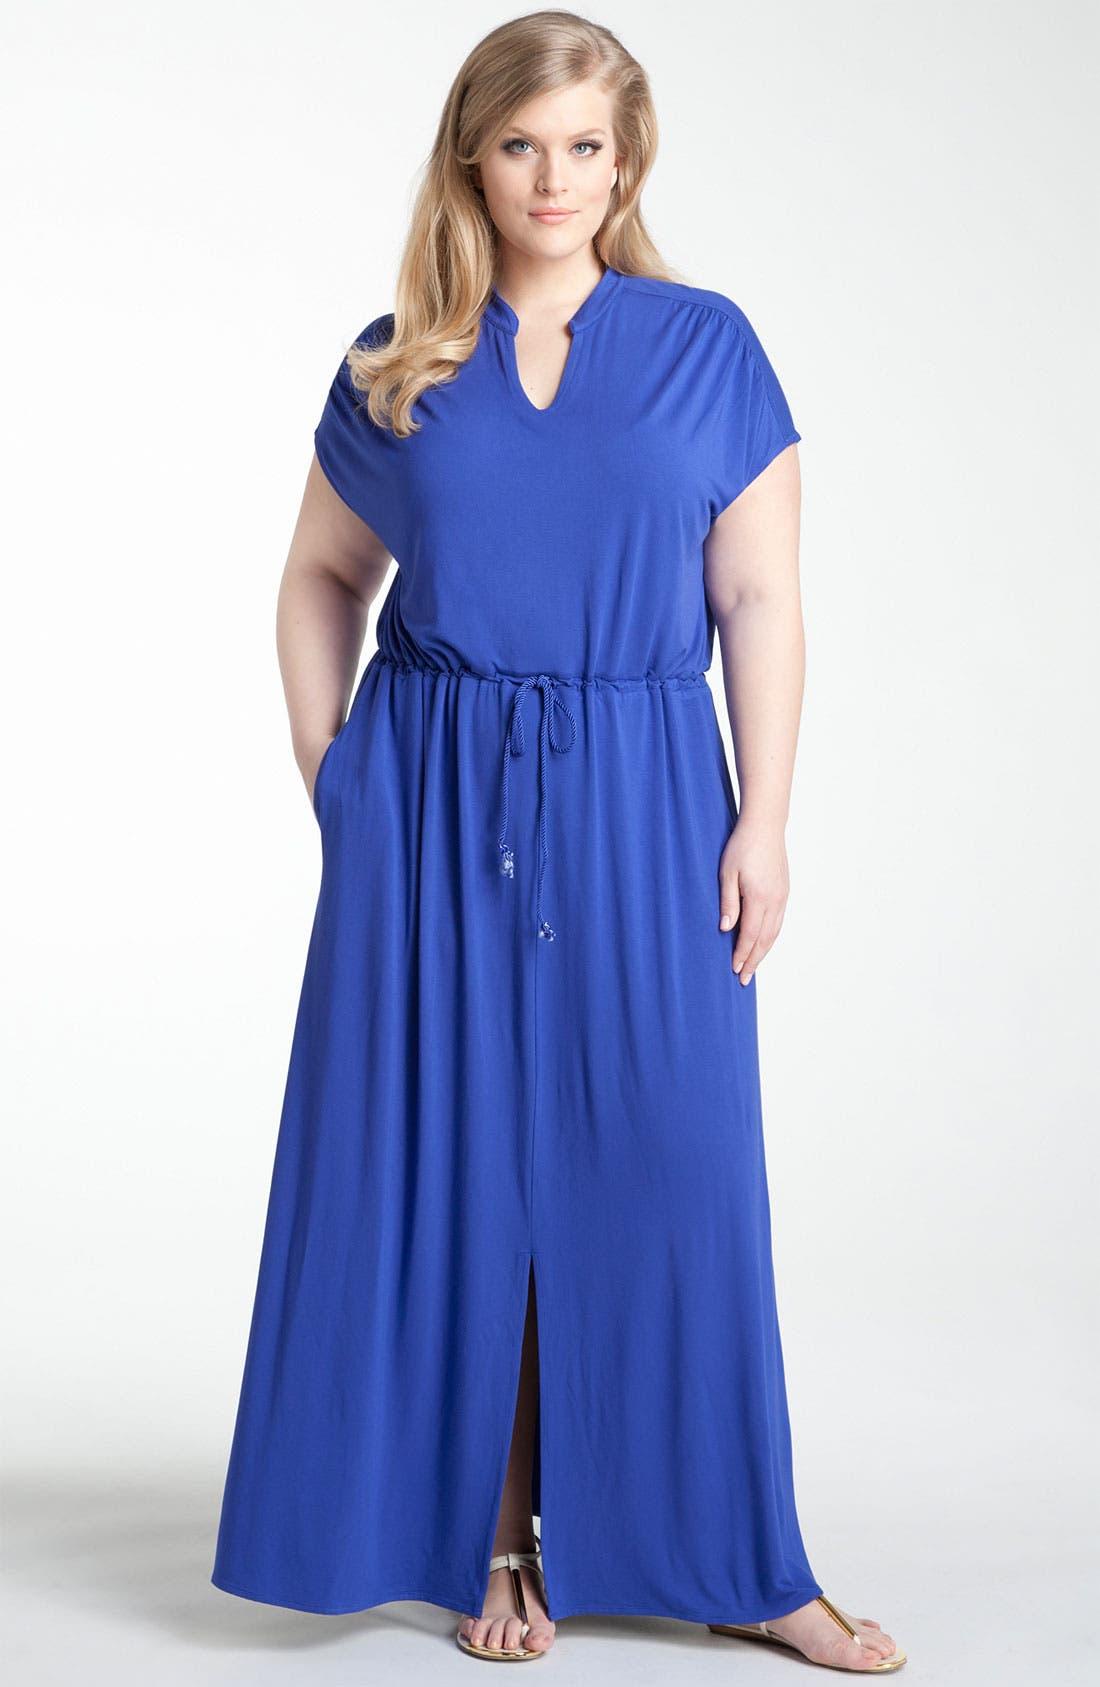 Alternate Image 1 Selected - Sejour Split Neck Knit Maxi Dress (Plus)